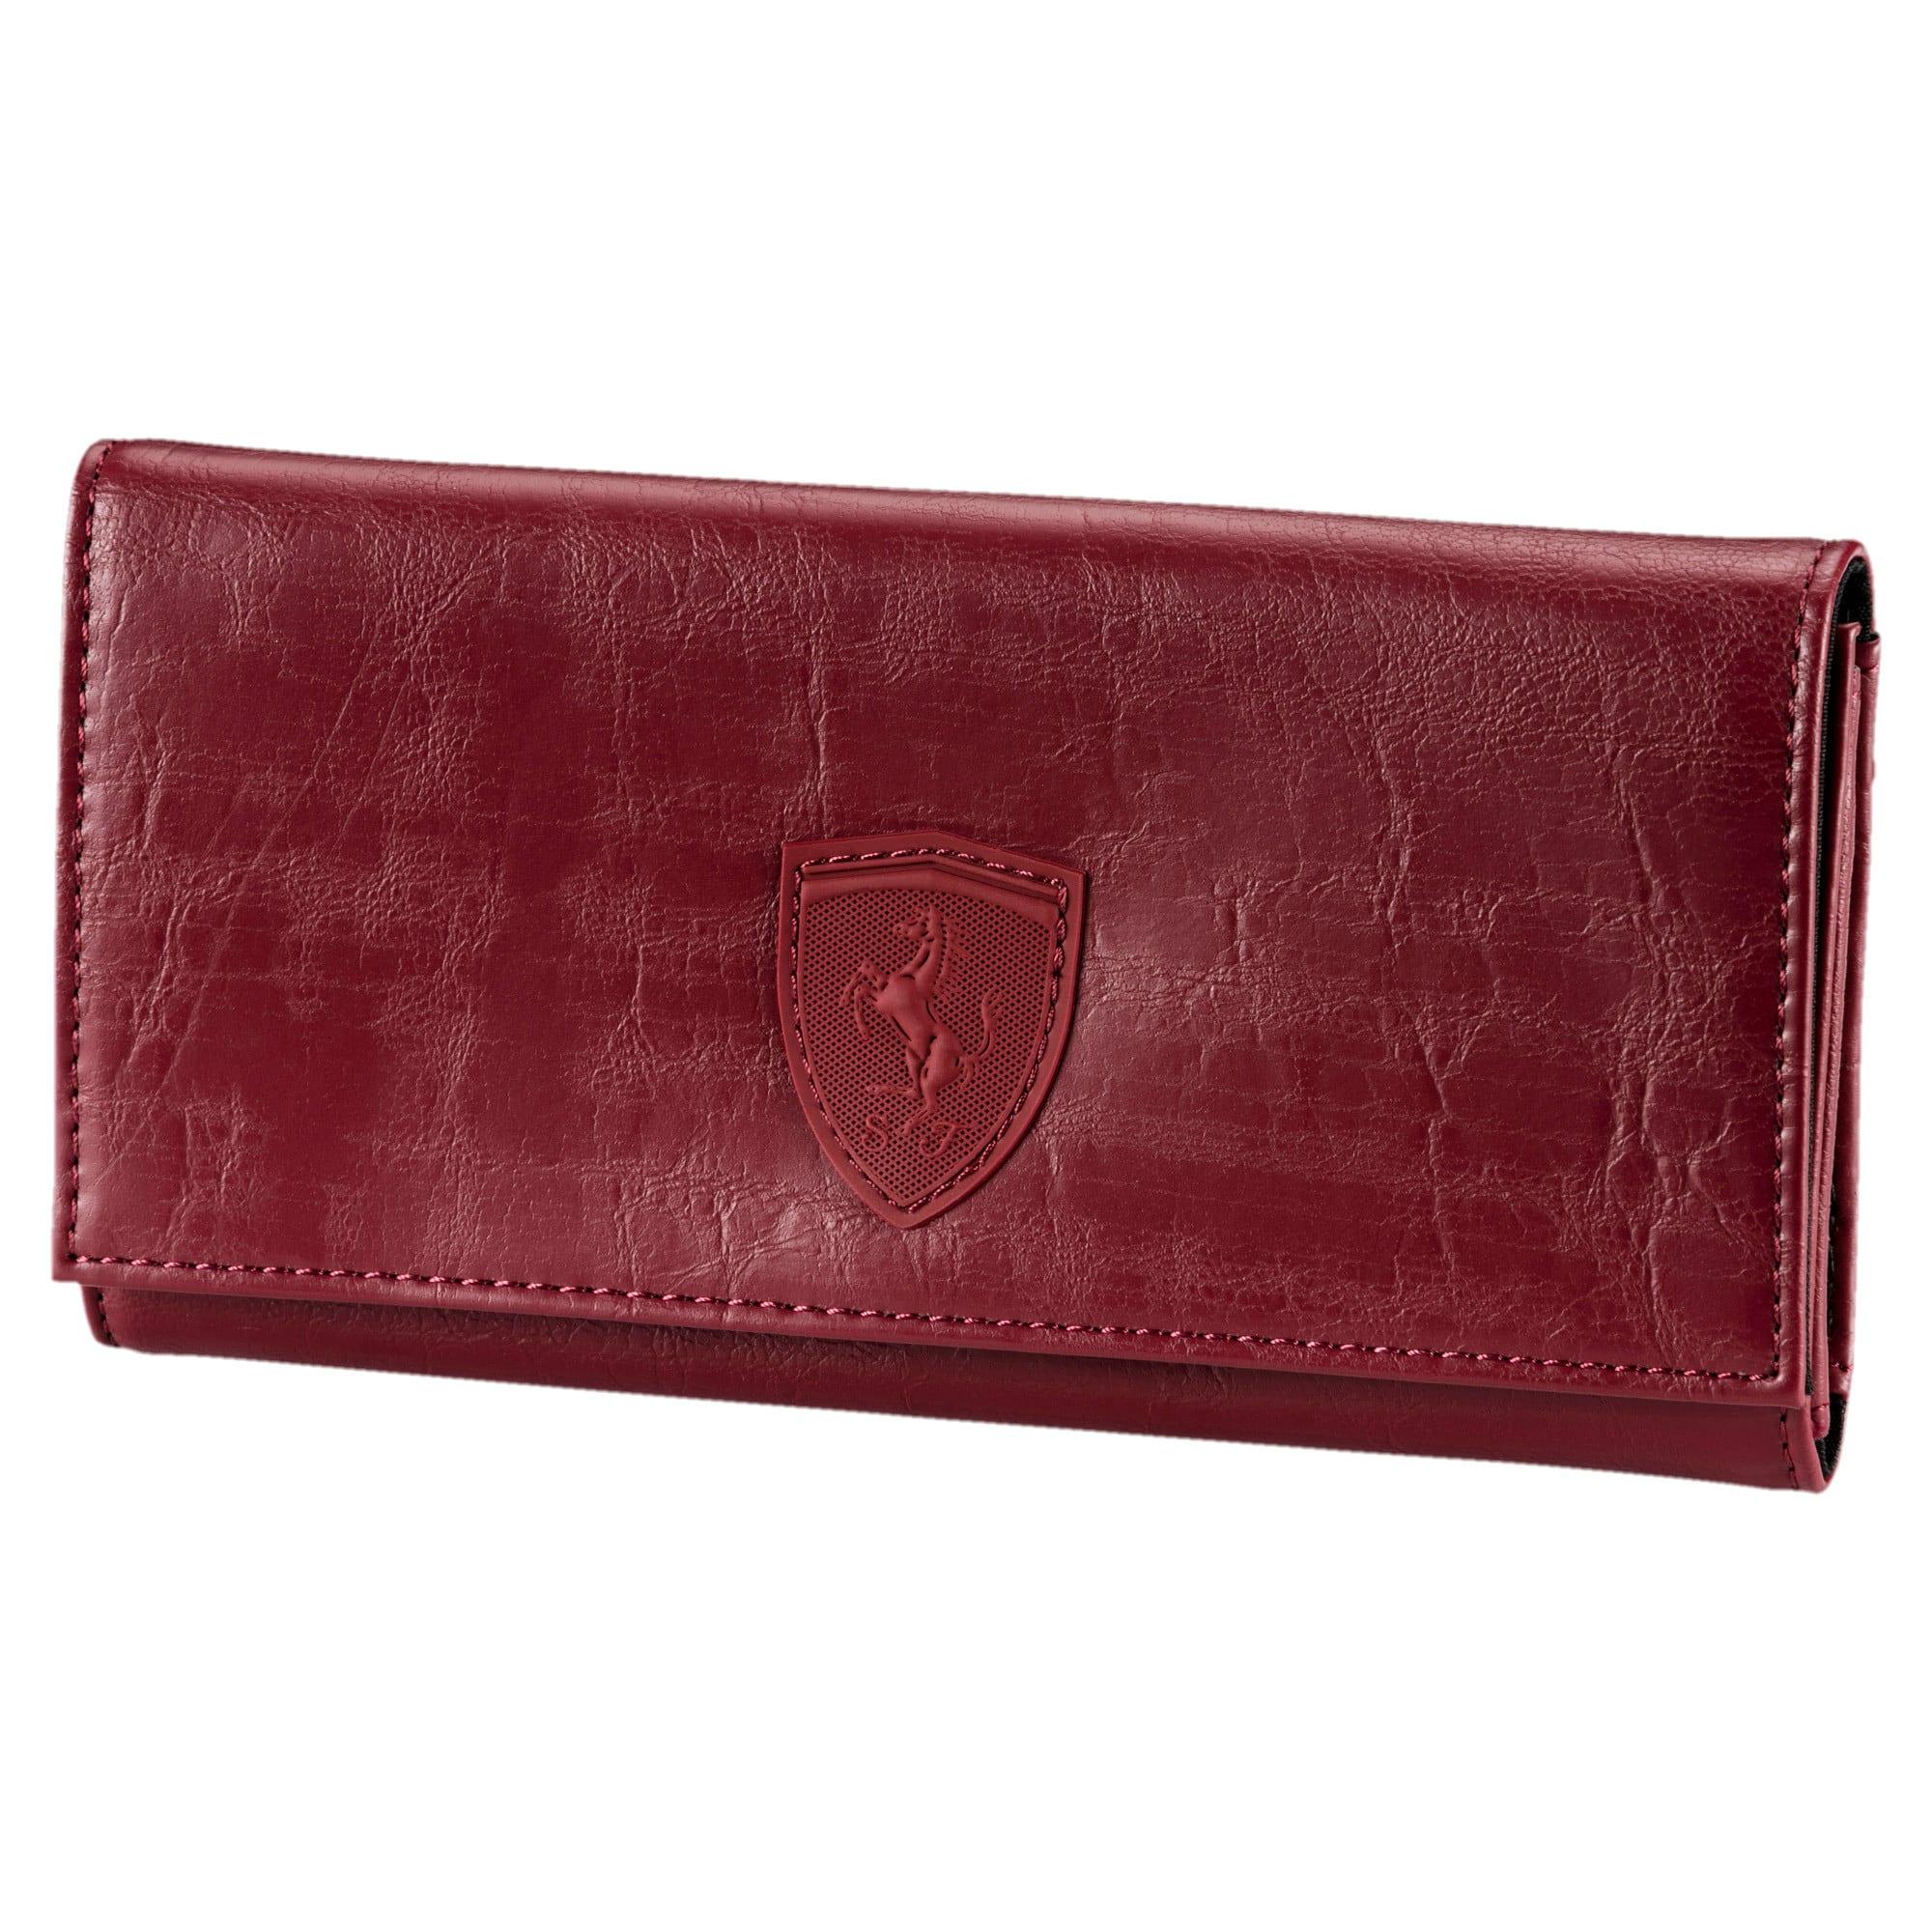 Thumbnail 1 of Ferrari Lifestyle Women's Wallet, Pomegranate, medium-SEA